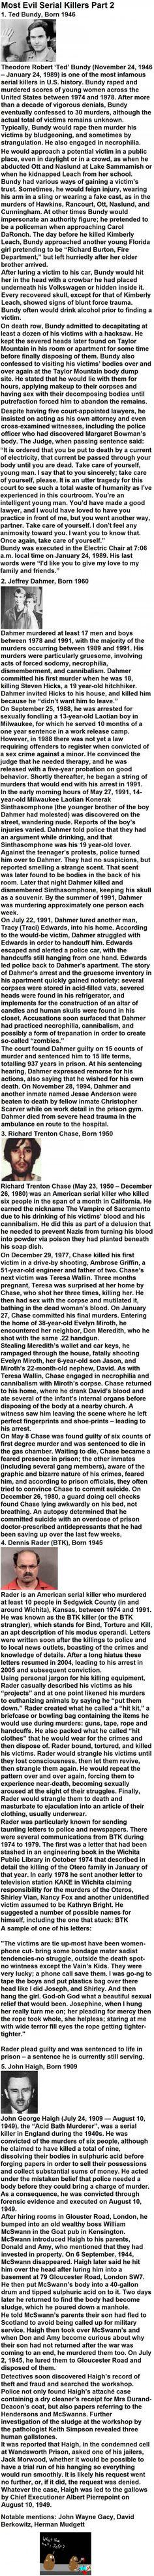 Most Evil Serial Killers Part 2